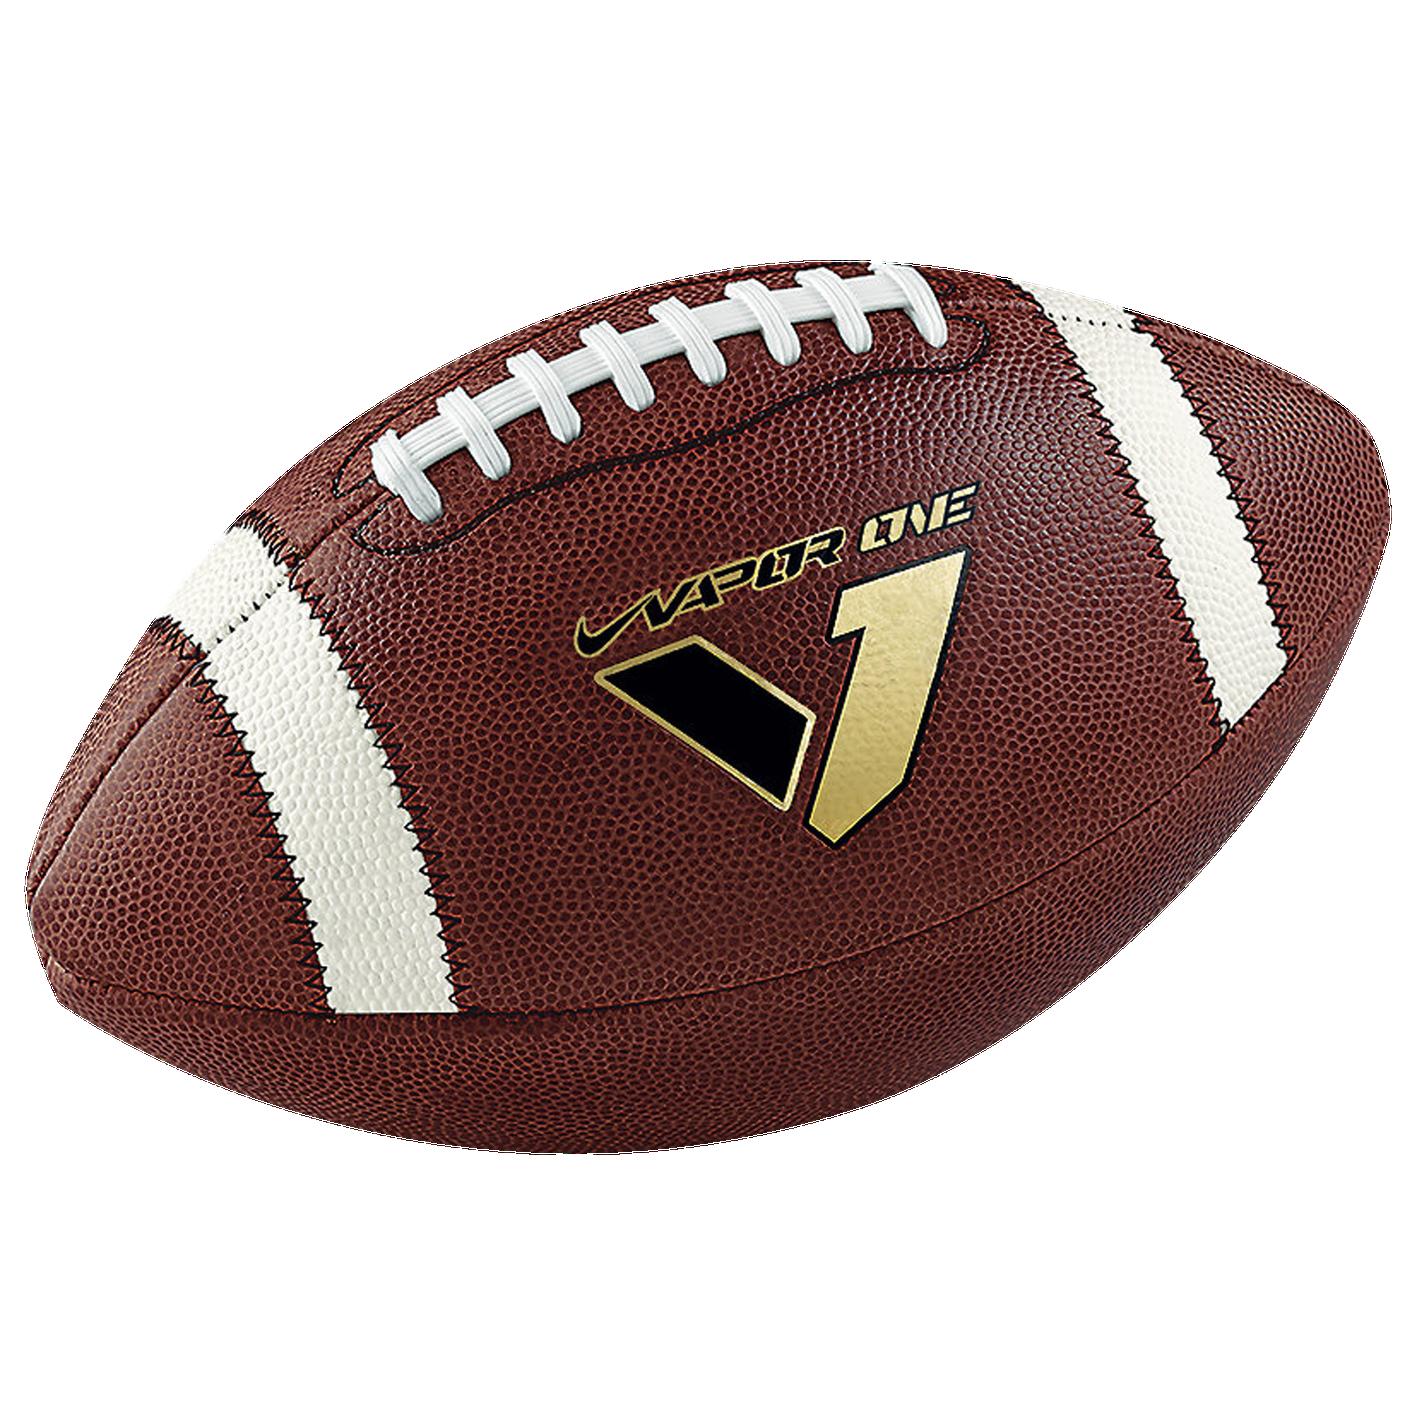 c46d0536c Nike Team Vapor One Football - Men s - Football - Sport Equipment